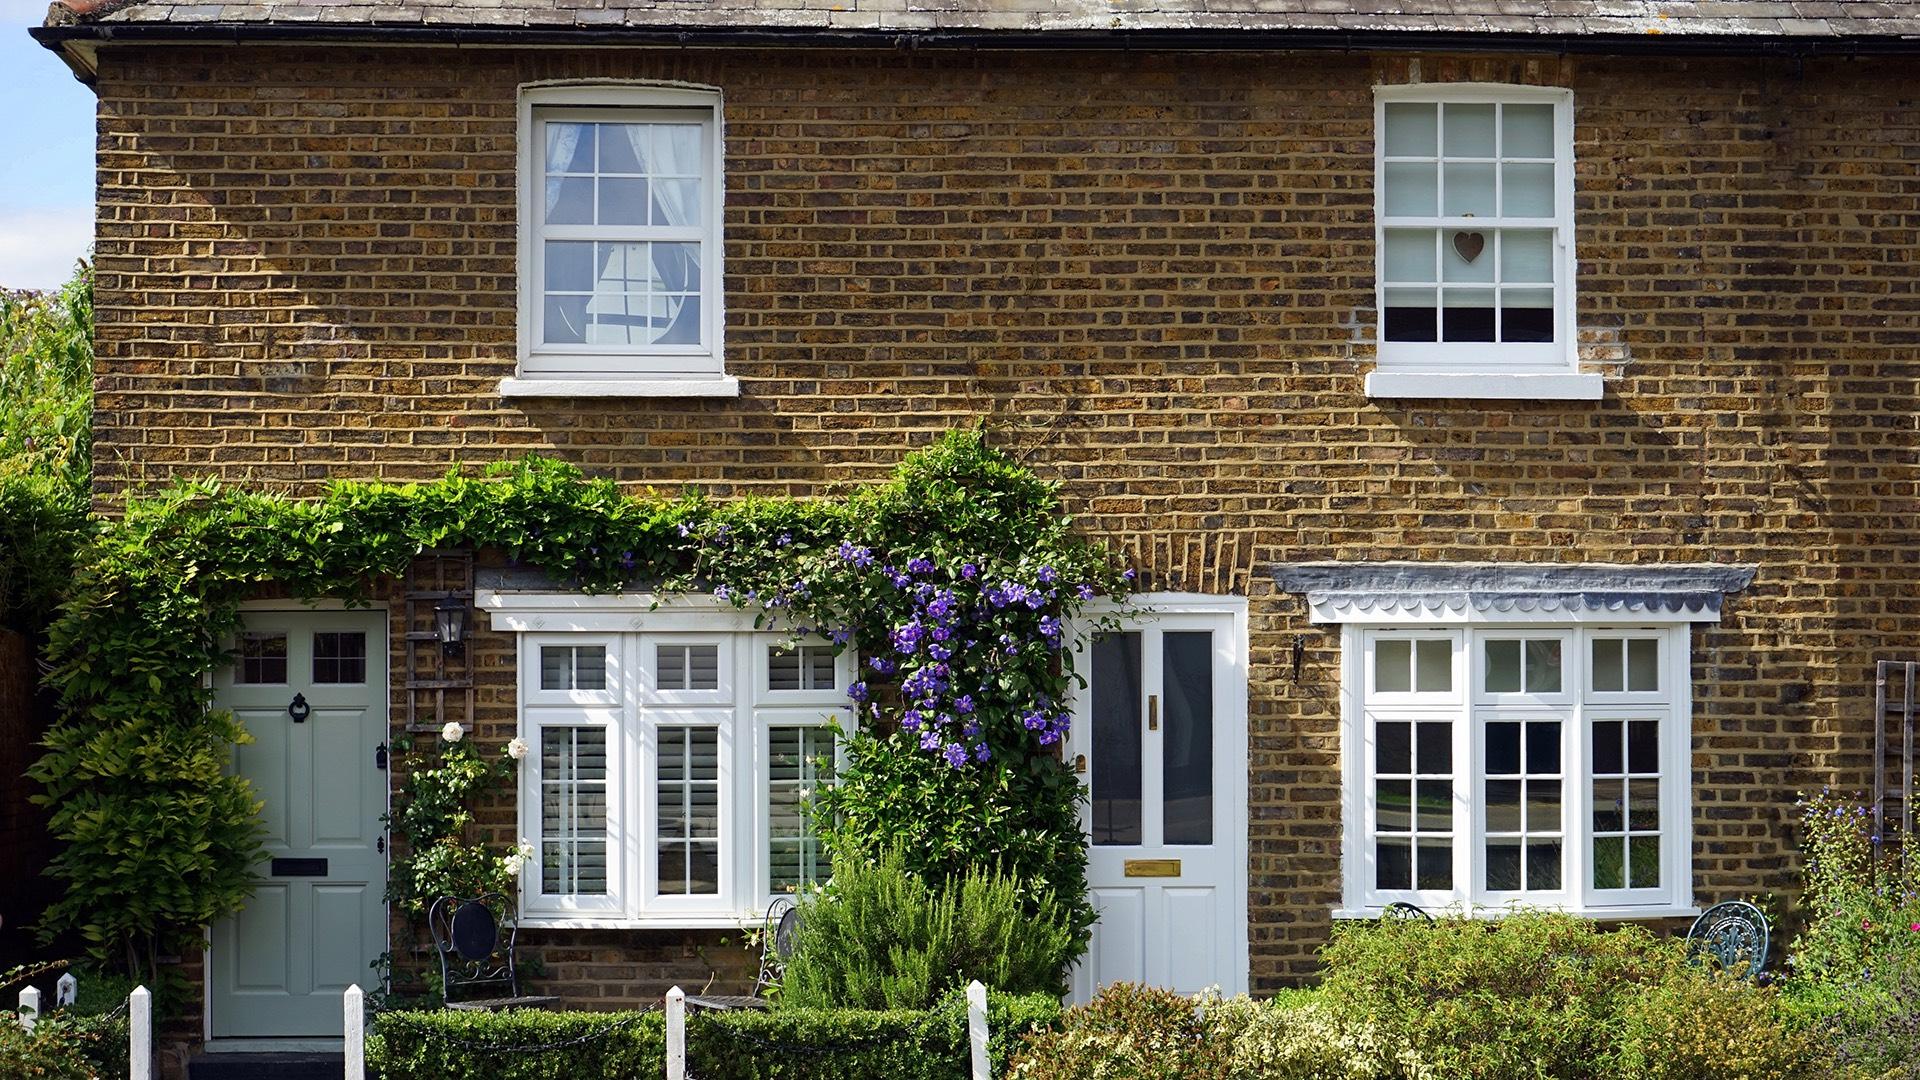 bay window replacement milton keynes